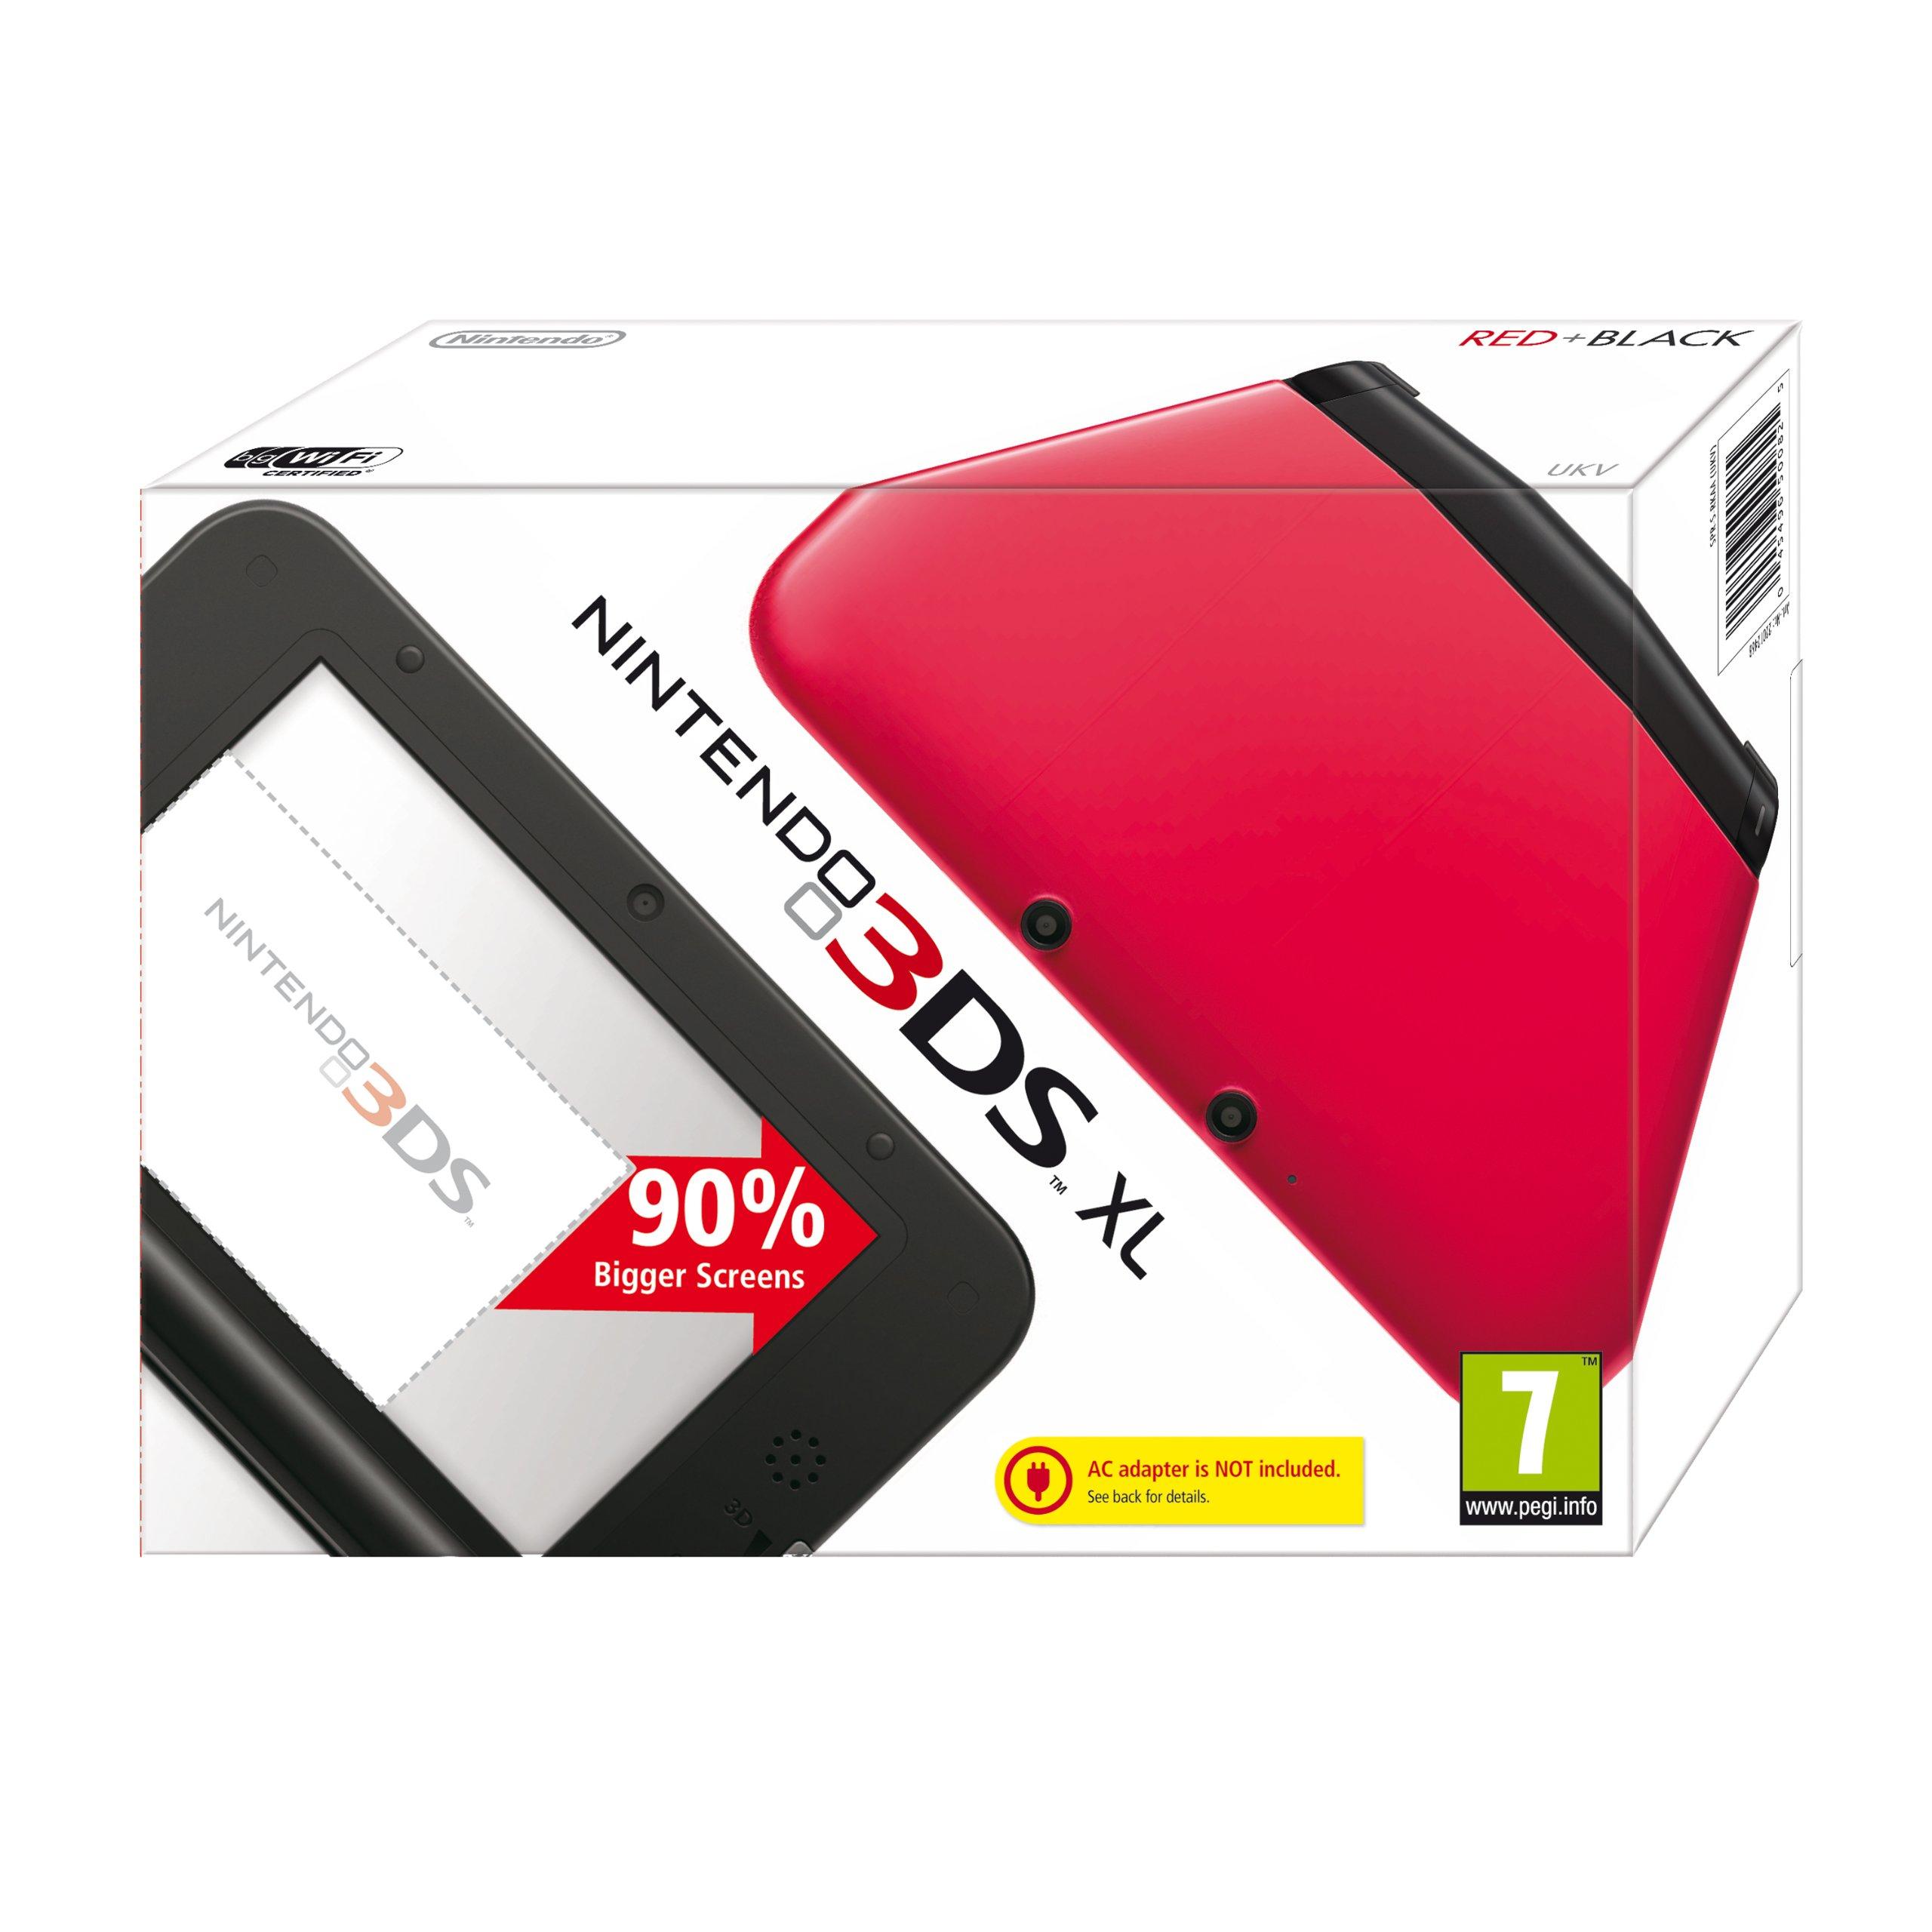 Nintendo Handheld Console - Red/Black (Nintendo 3DS XL